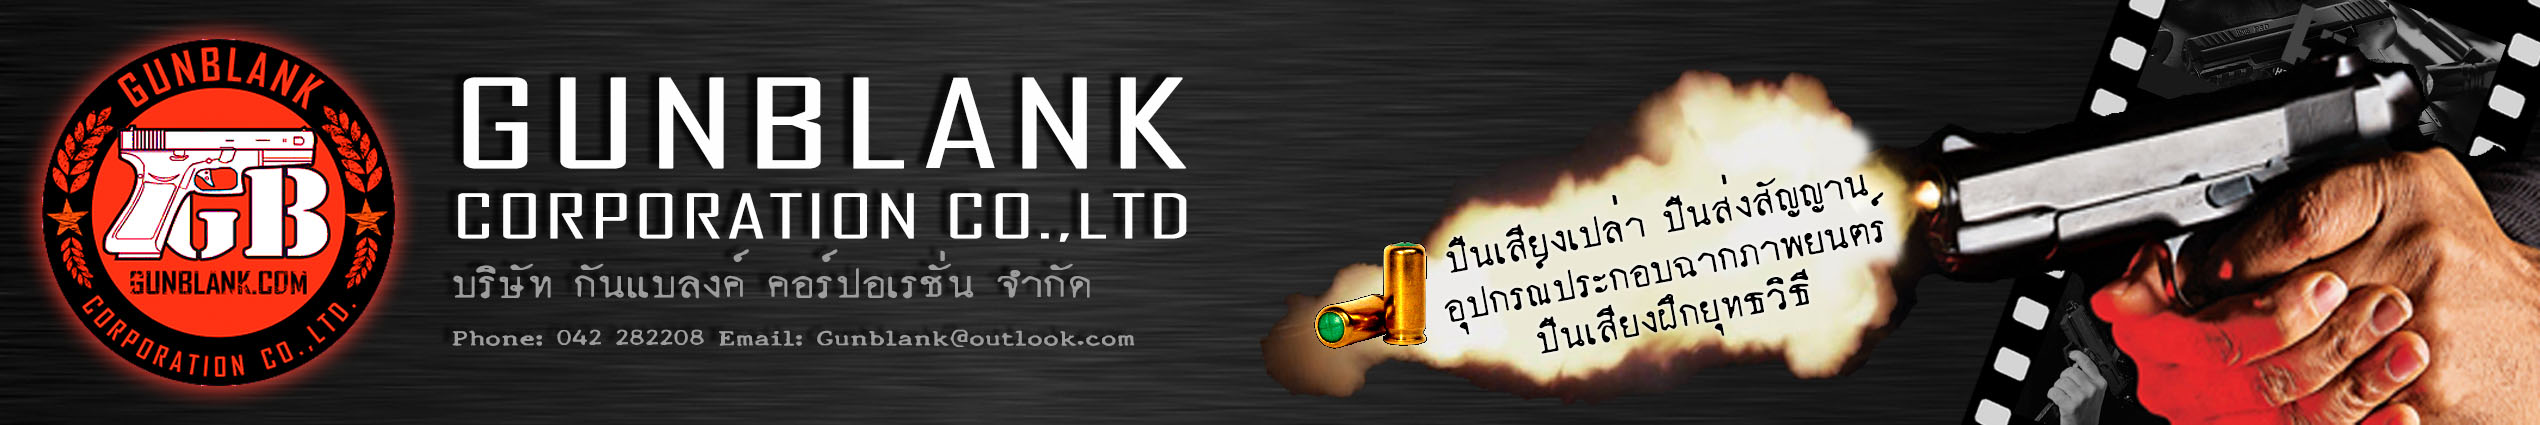 Gunblank Corporation